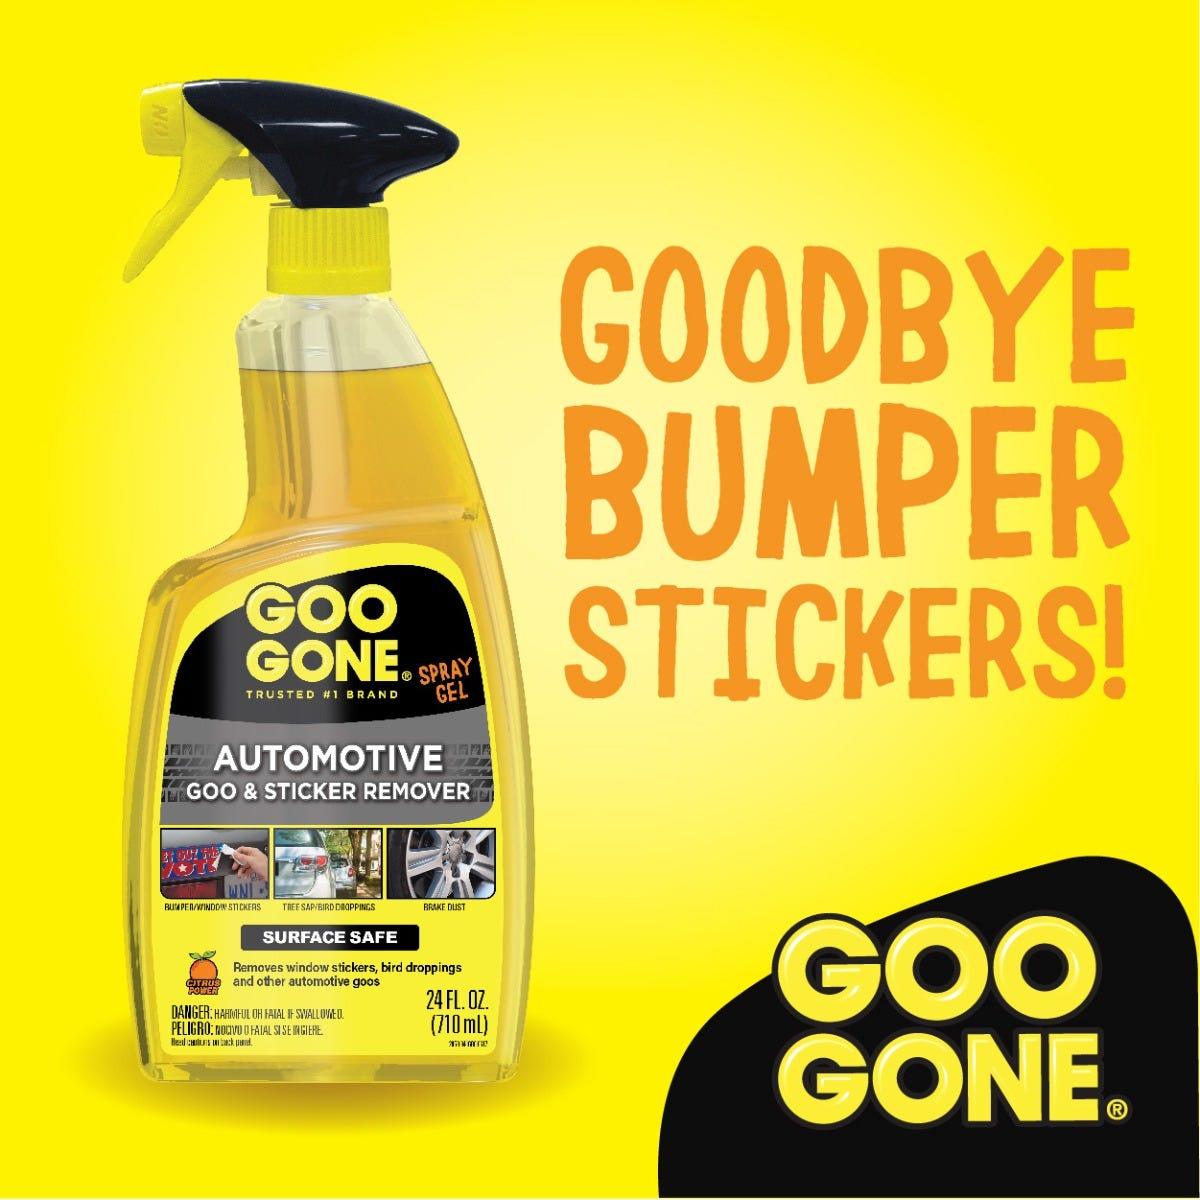 Goodbye bumper stickers